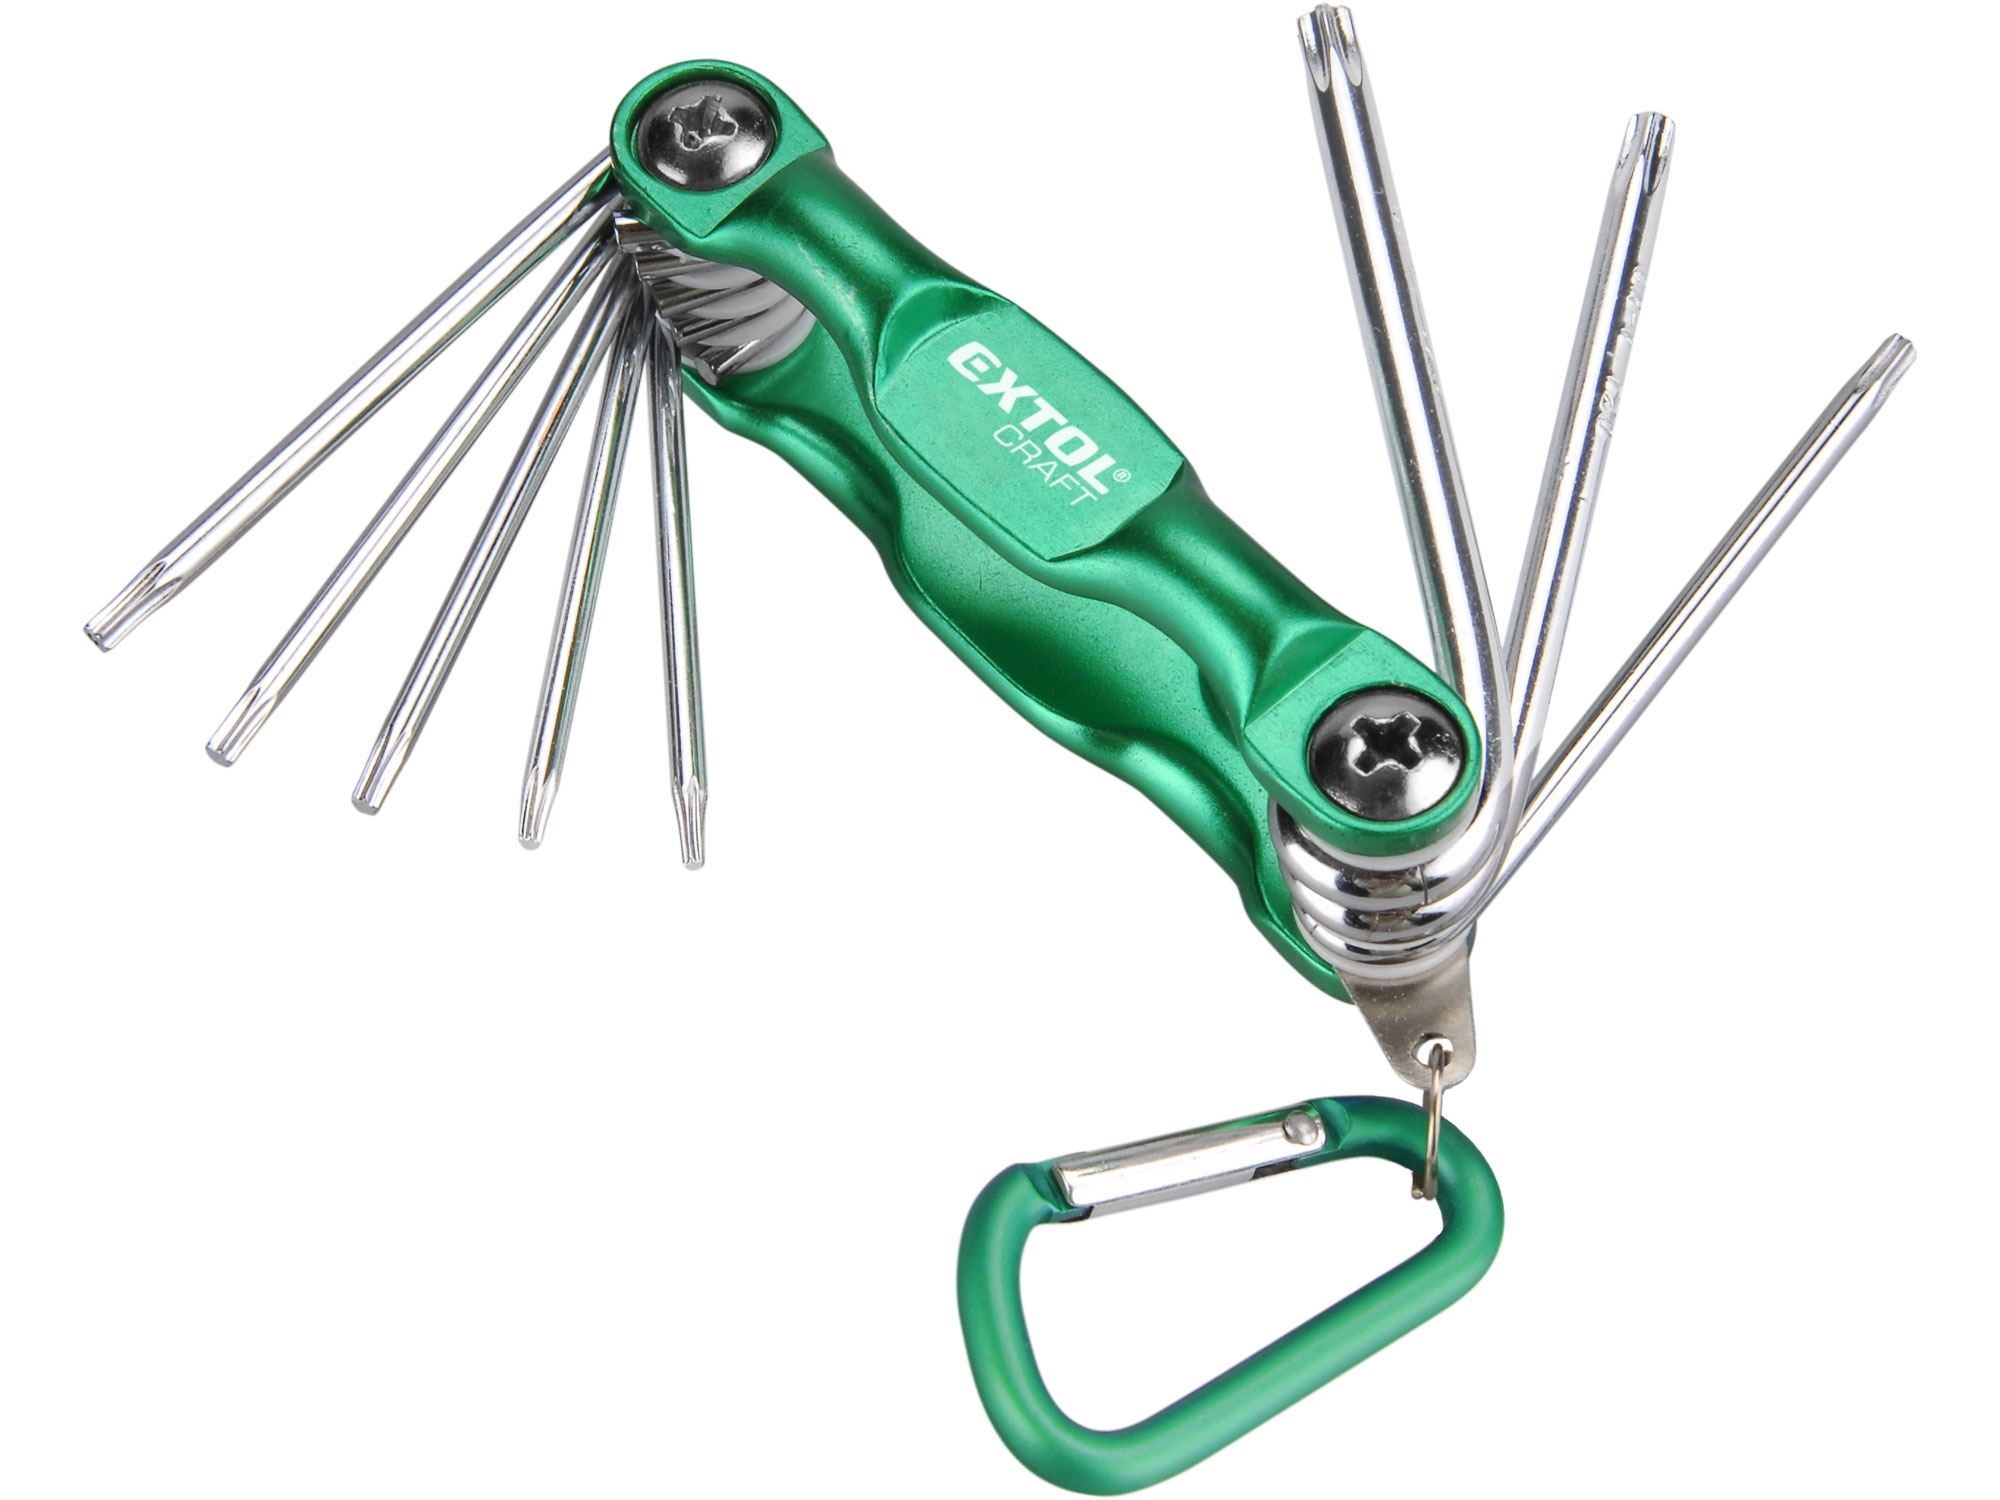 klíče TORX, sada 8ks, T6-25mm, EXTOL CRAFT 66016